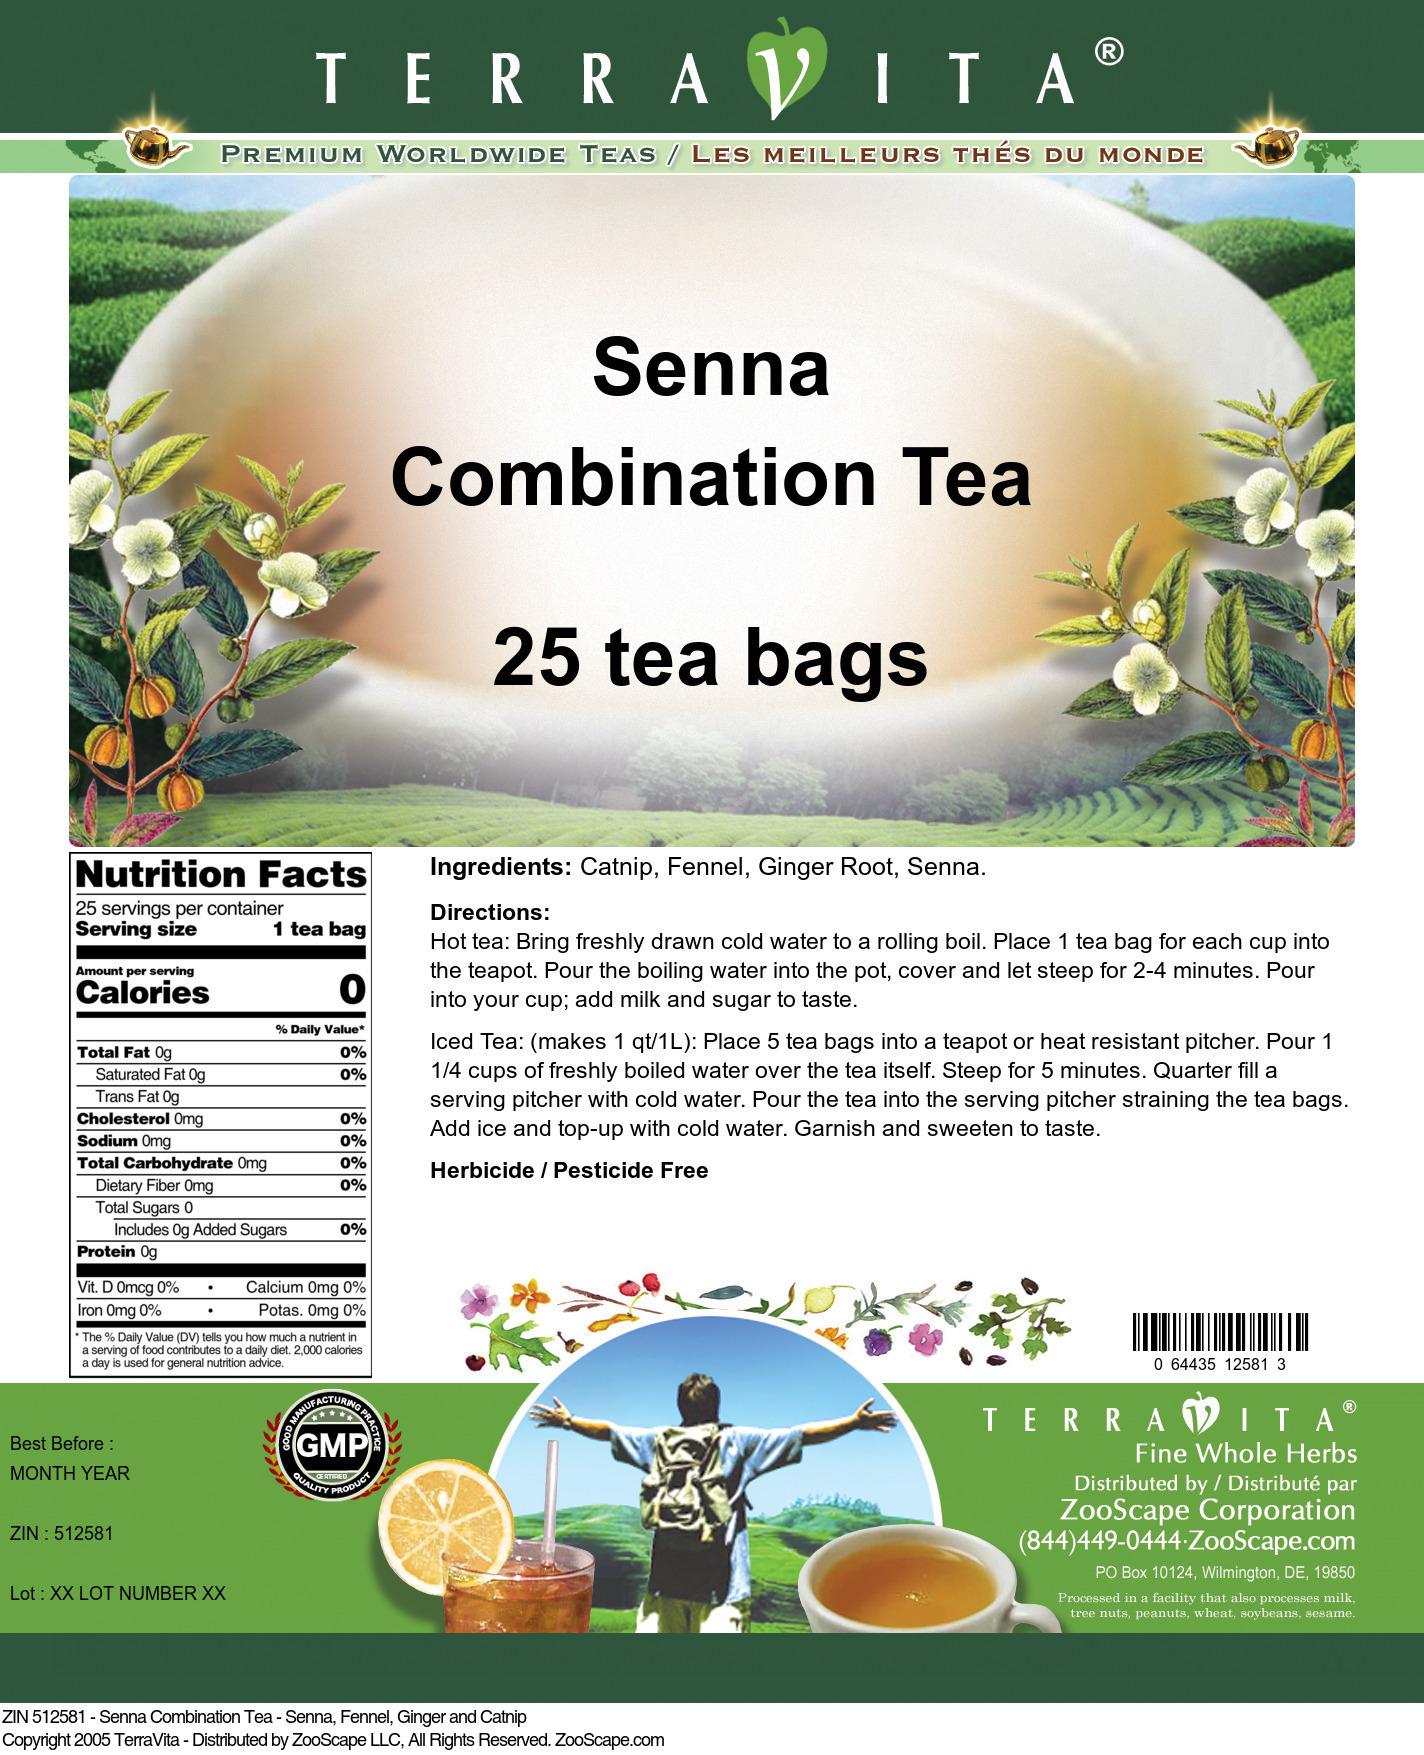 Senna Combination Tea - Senna, Fennel, Ginger and Catnip